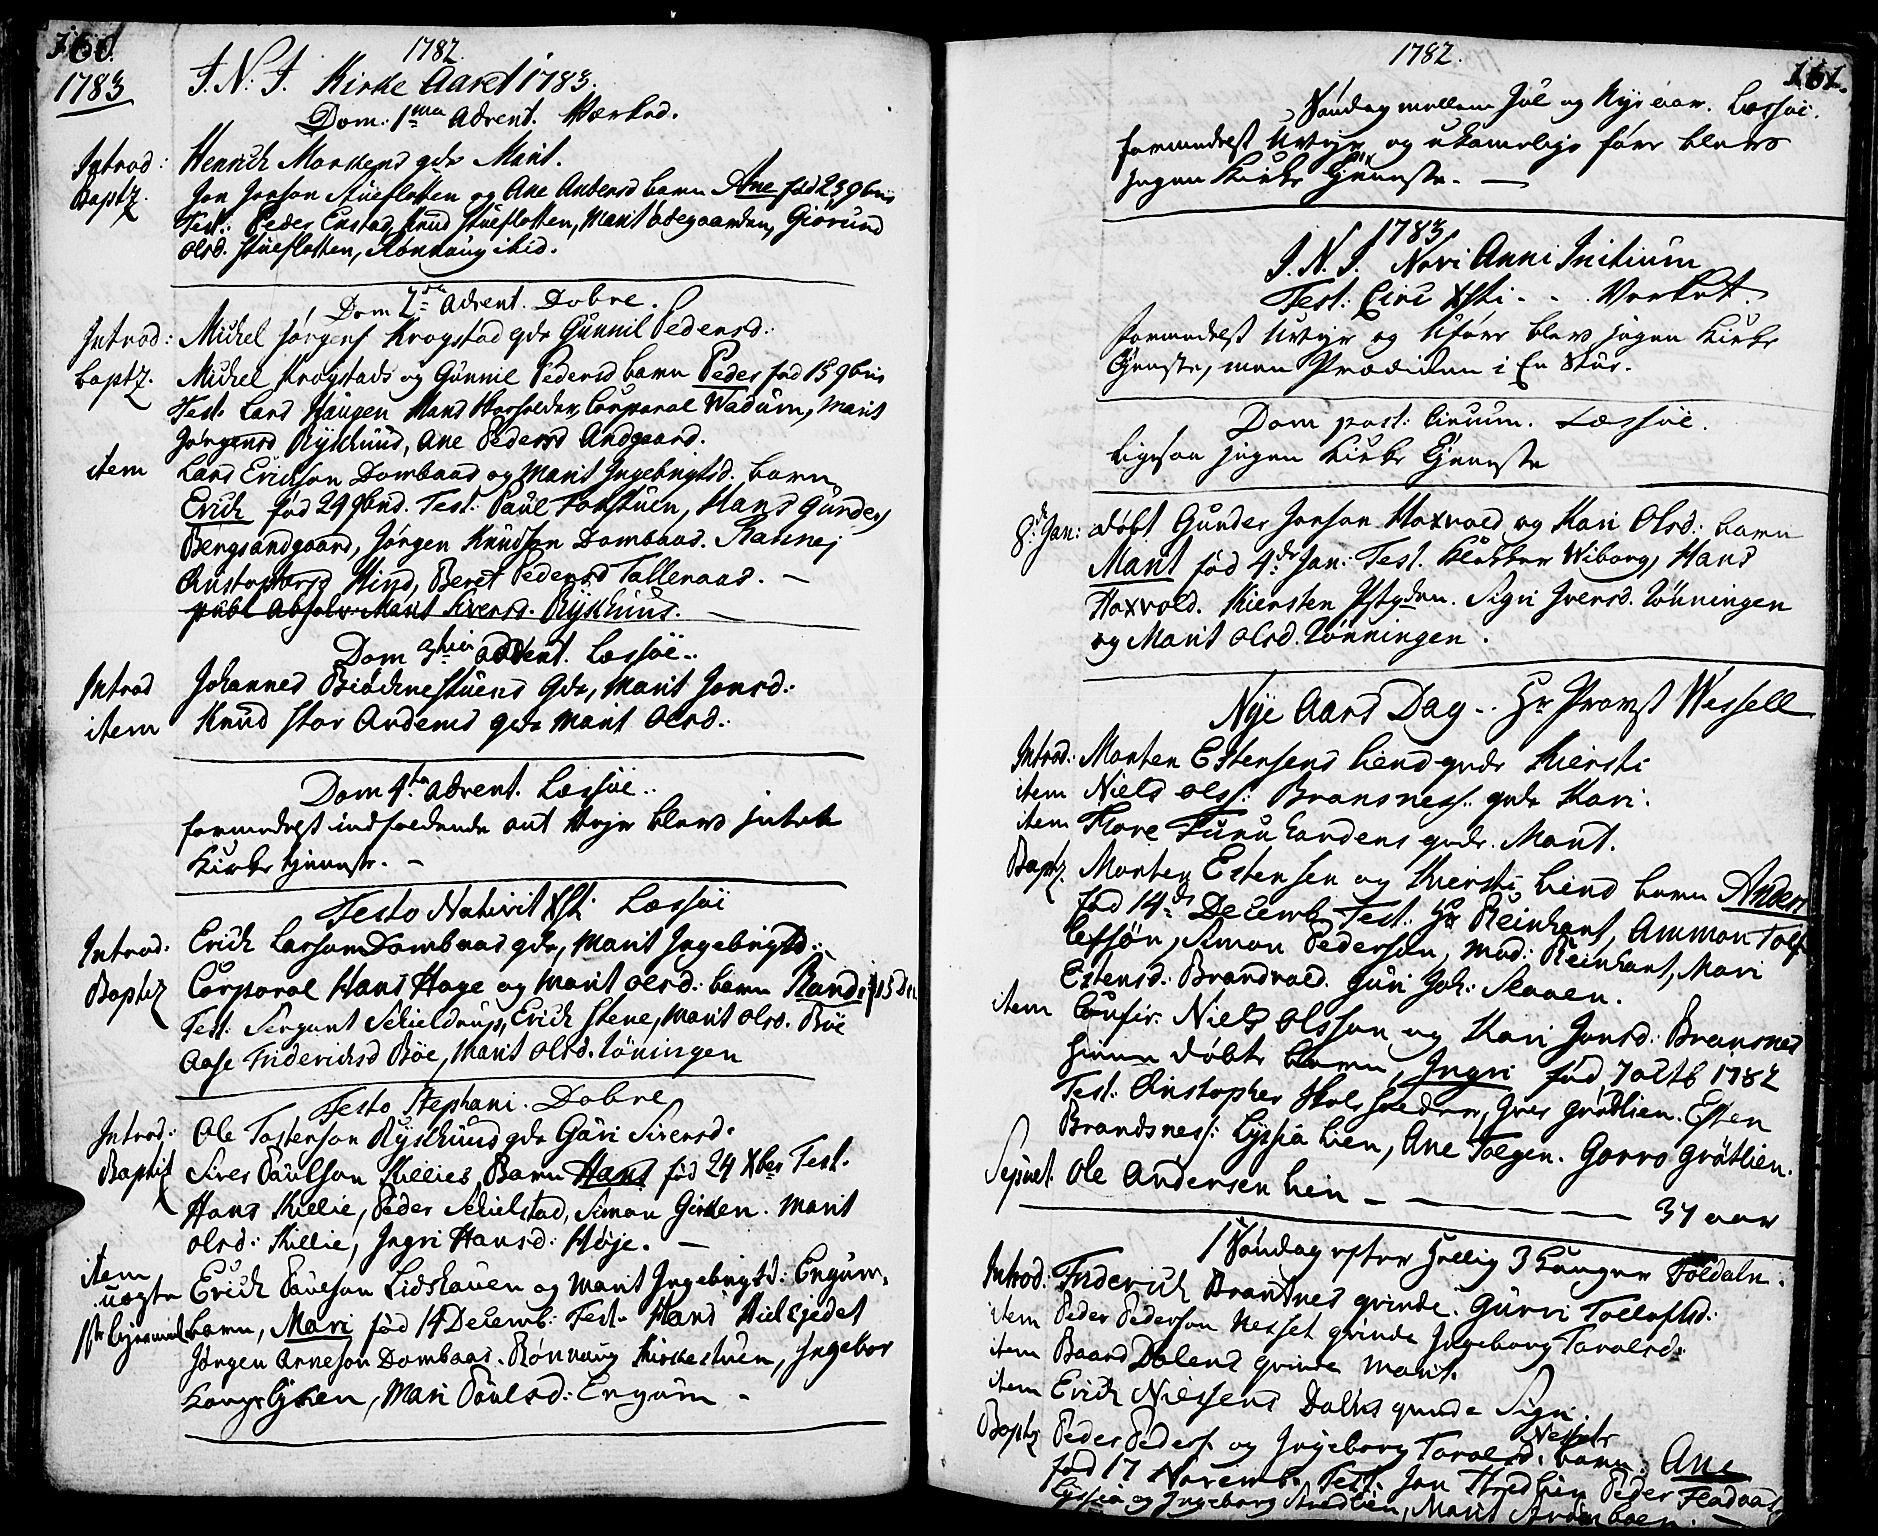 SAH, Lesja prestekontor, Ministerialbok nr. 3, 1777-1819, s. 160-161